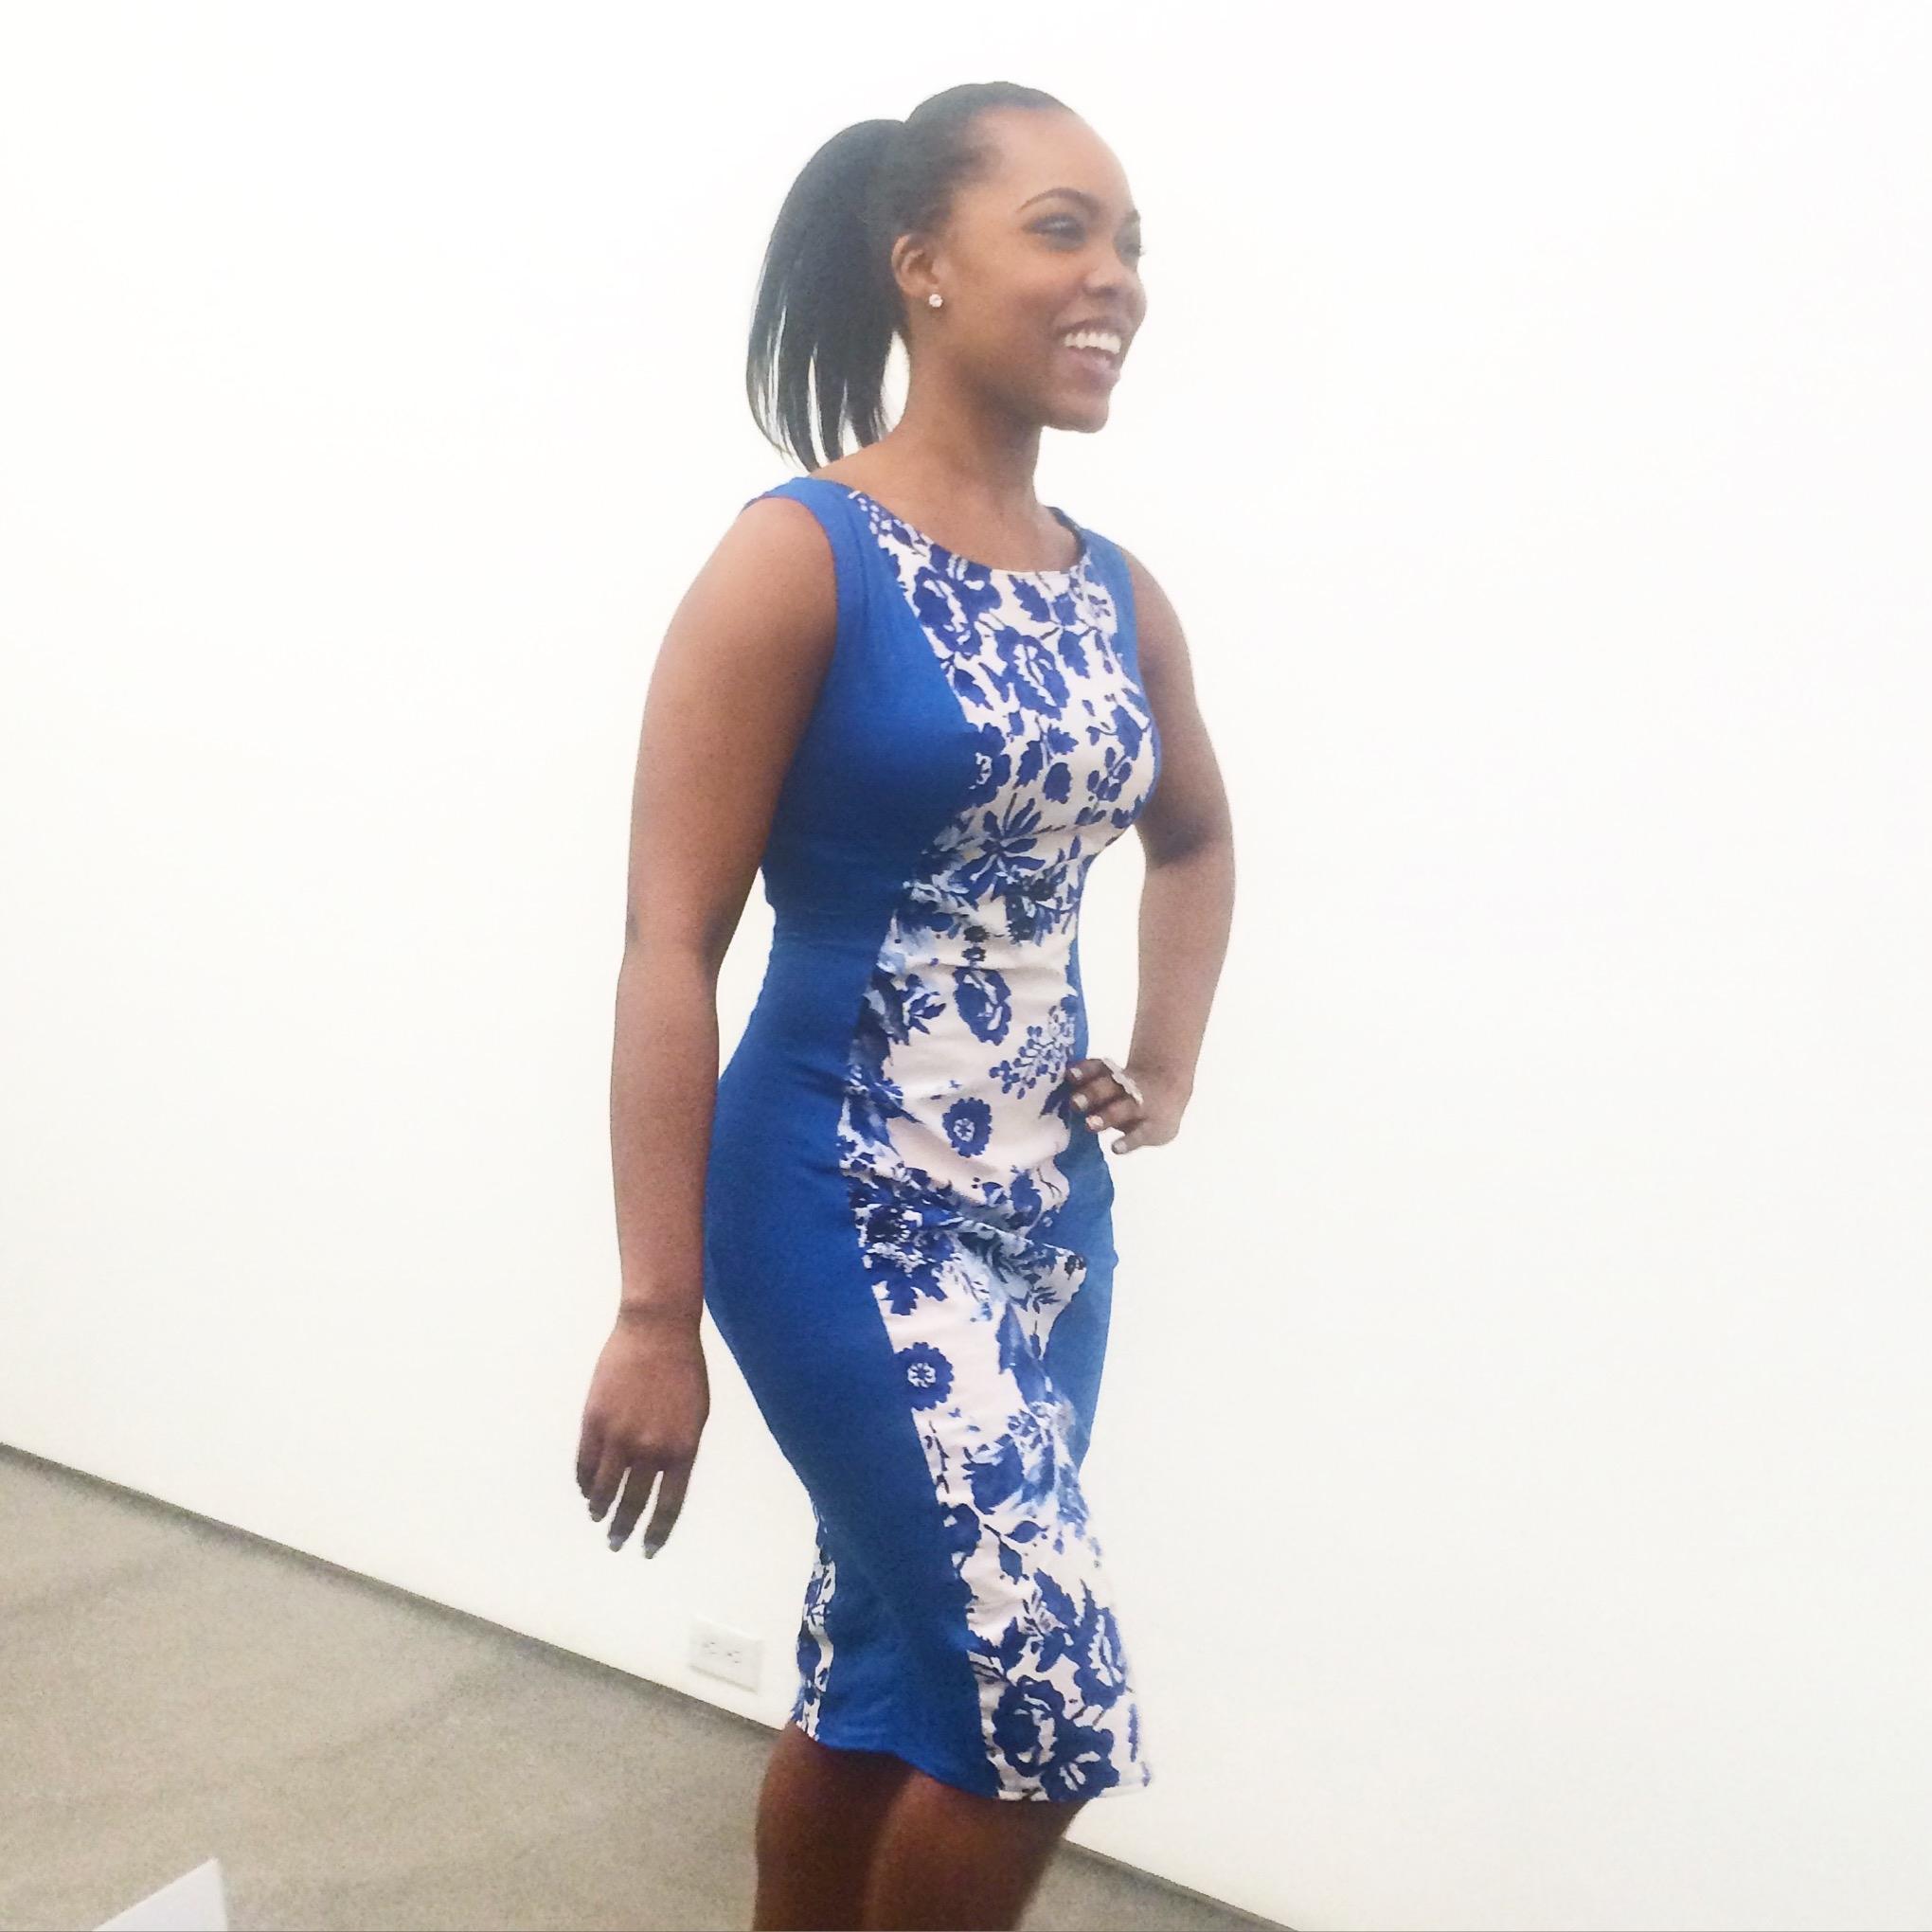 6537d41f8 Body Positive Plus Size Models NYC NYFW Fashion Week Fashion Show Natural  Hair Curvy Woman Runway